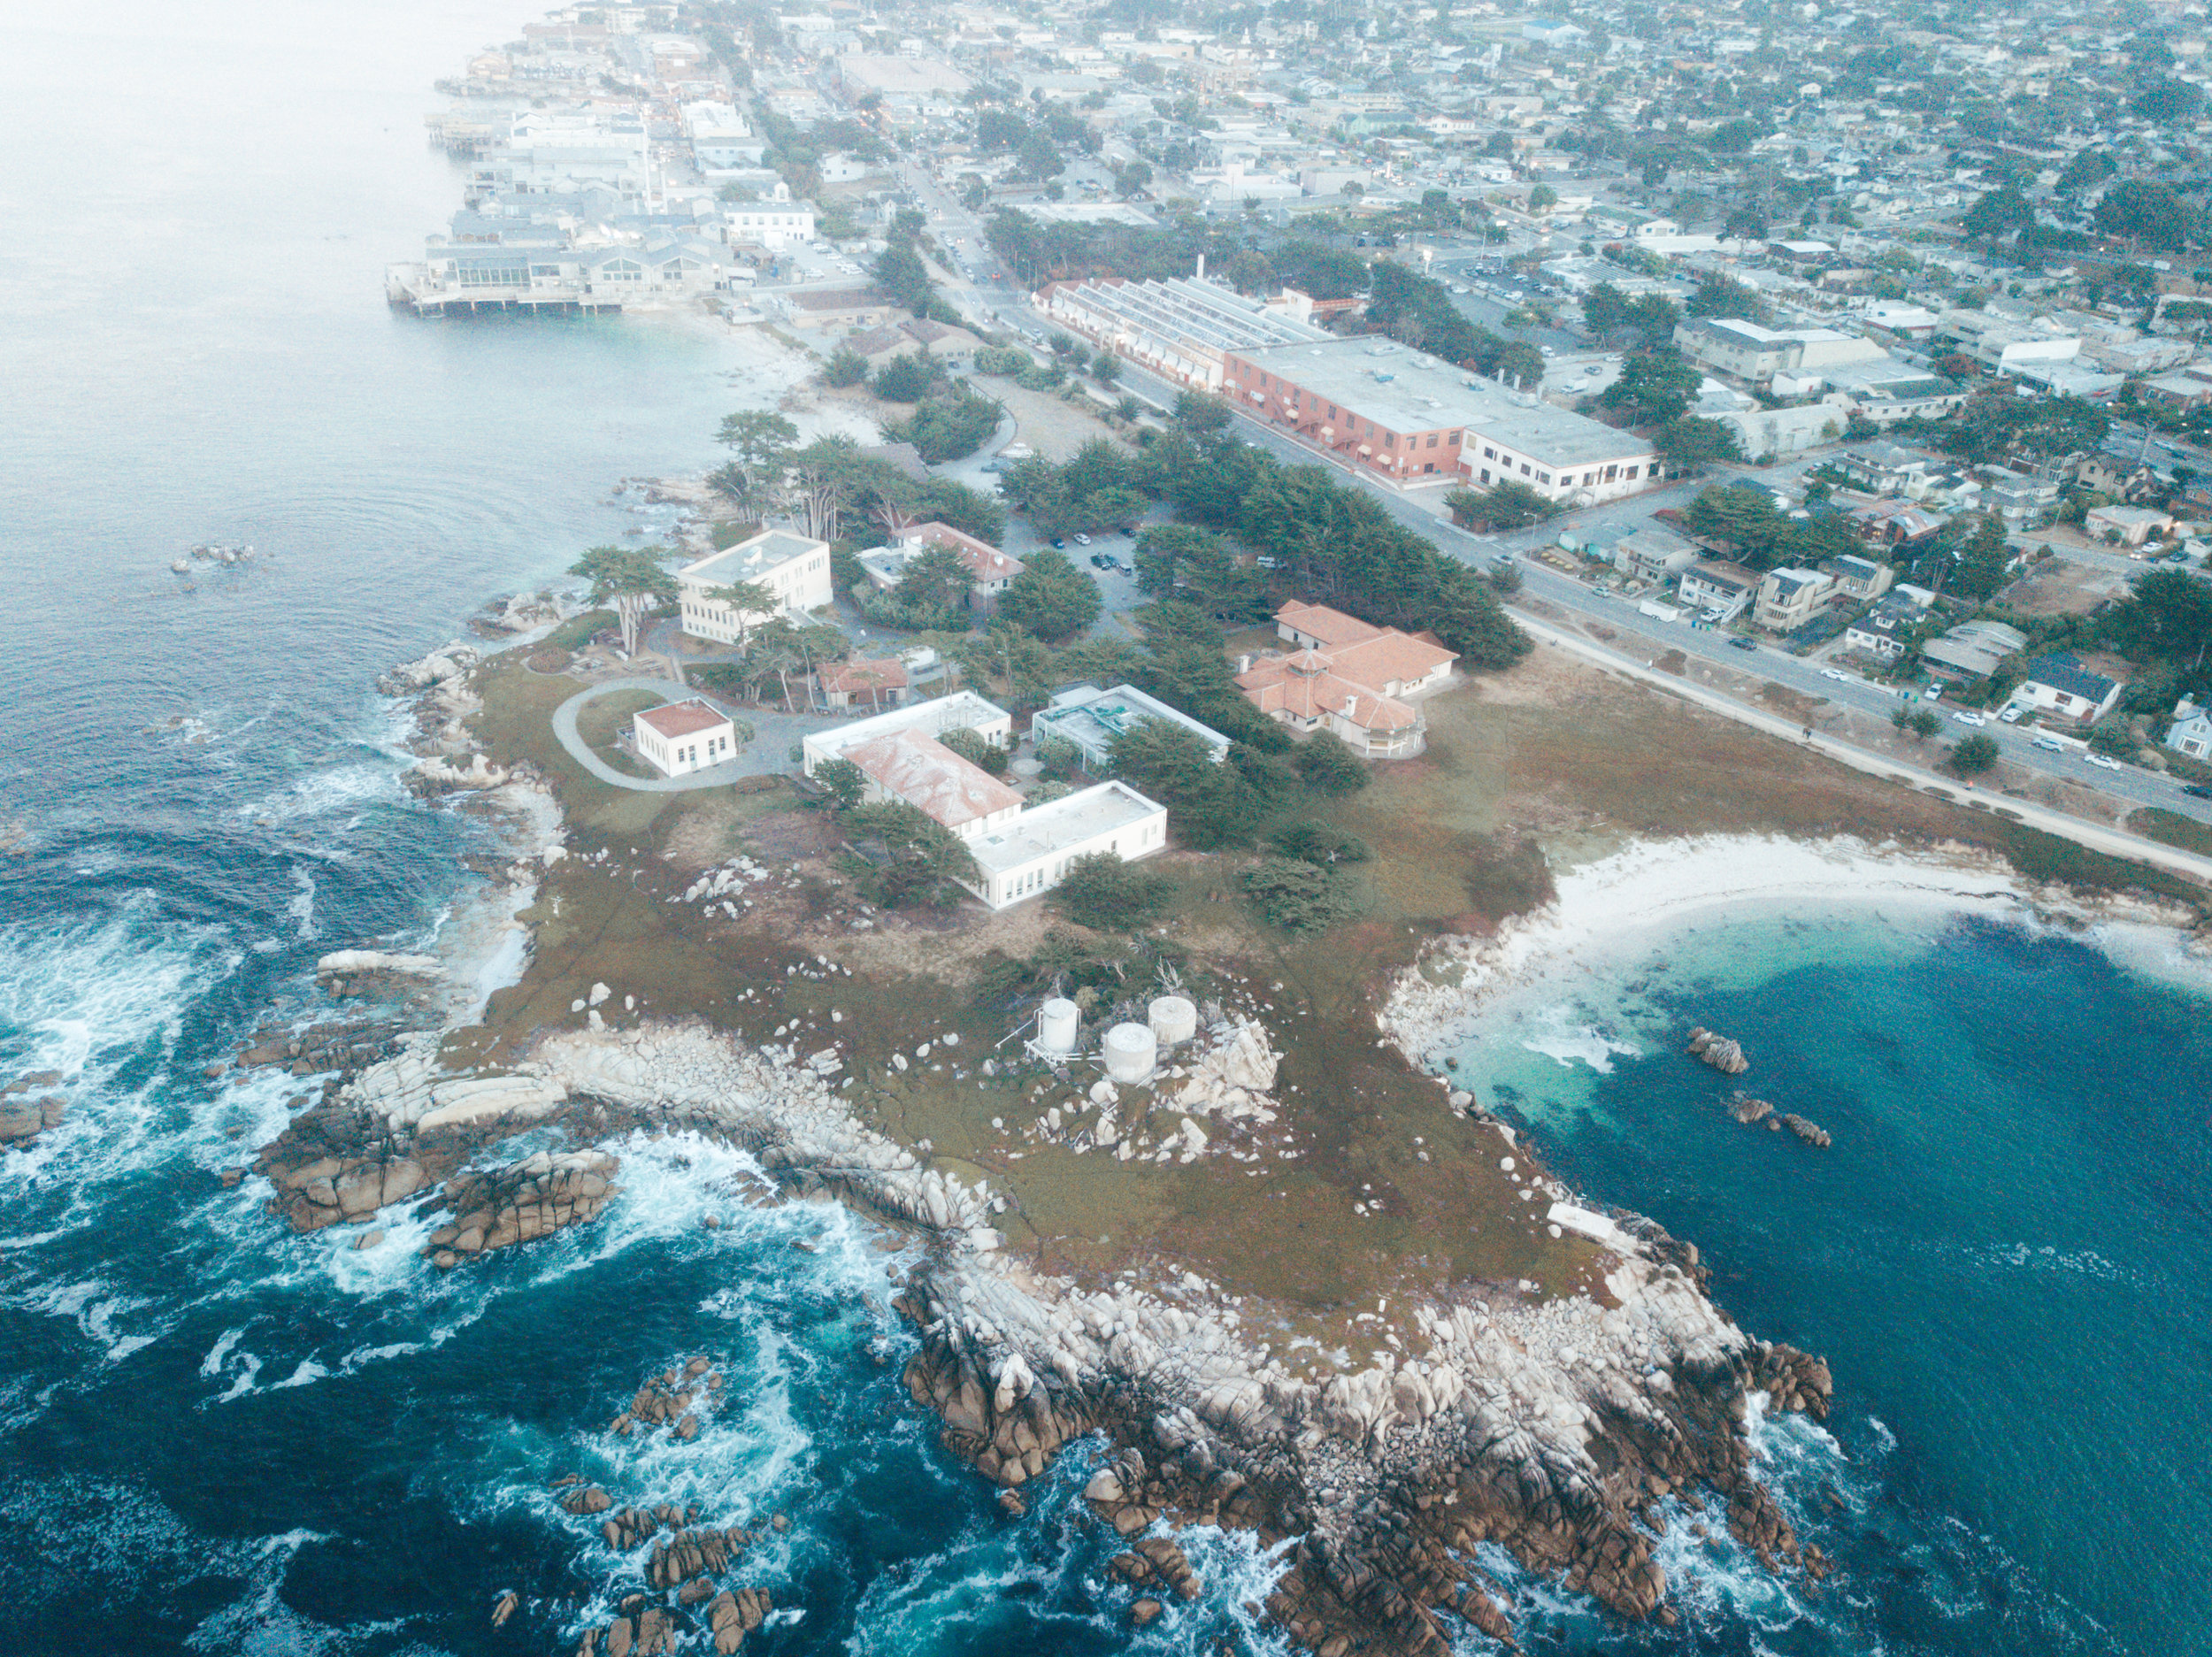 Stay_Driven_Monterey_Drone-1-3.jpg